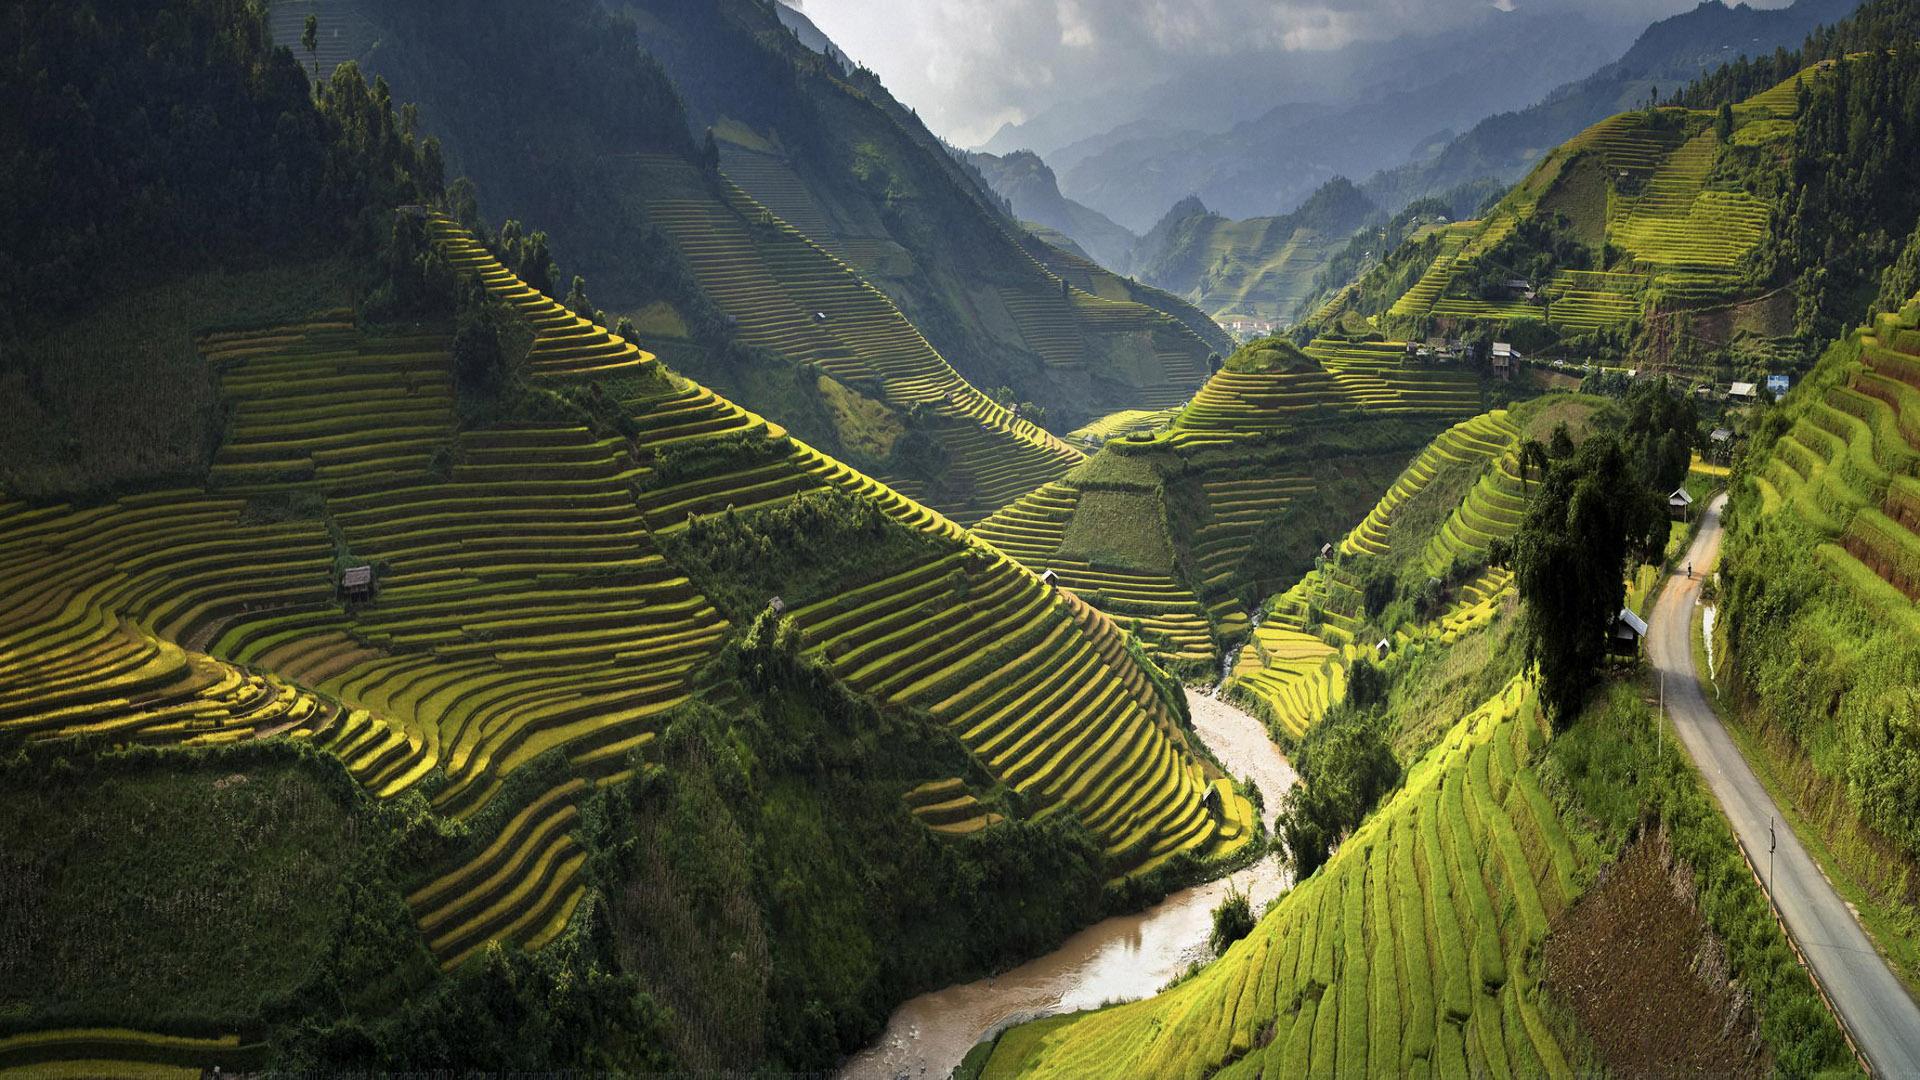 Vietnam Hd Free Wallpapers In Usa Hd Wallpaper